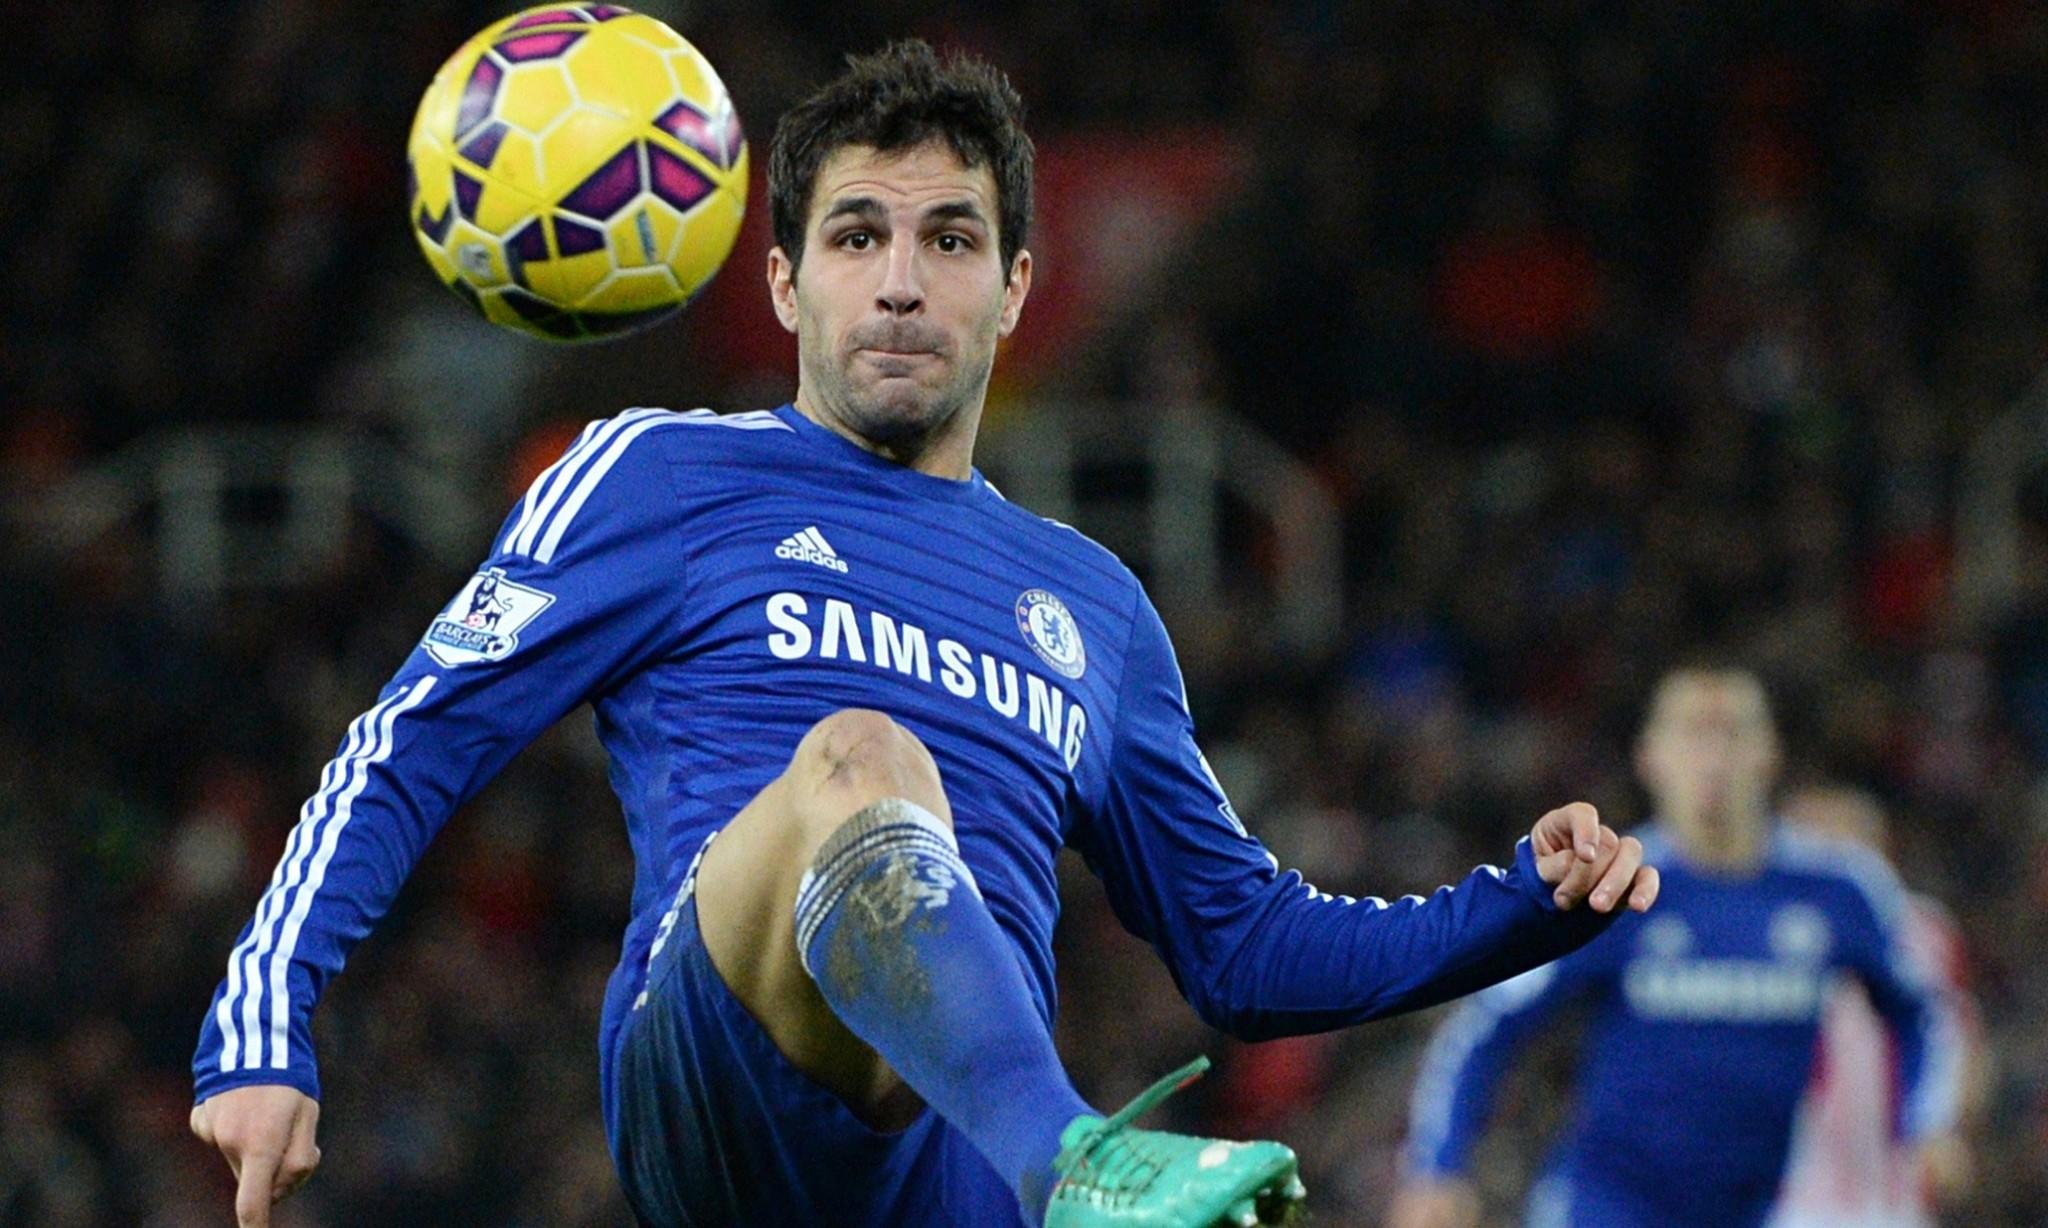 How science is fine-tuning elite footballers